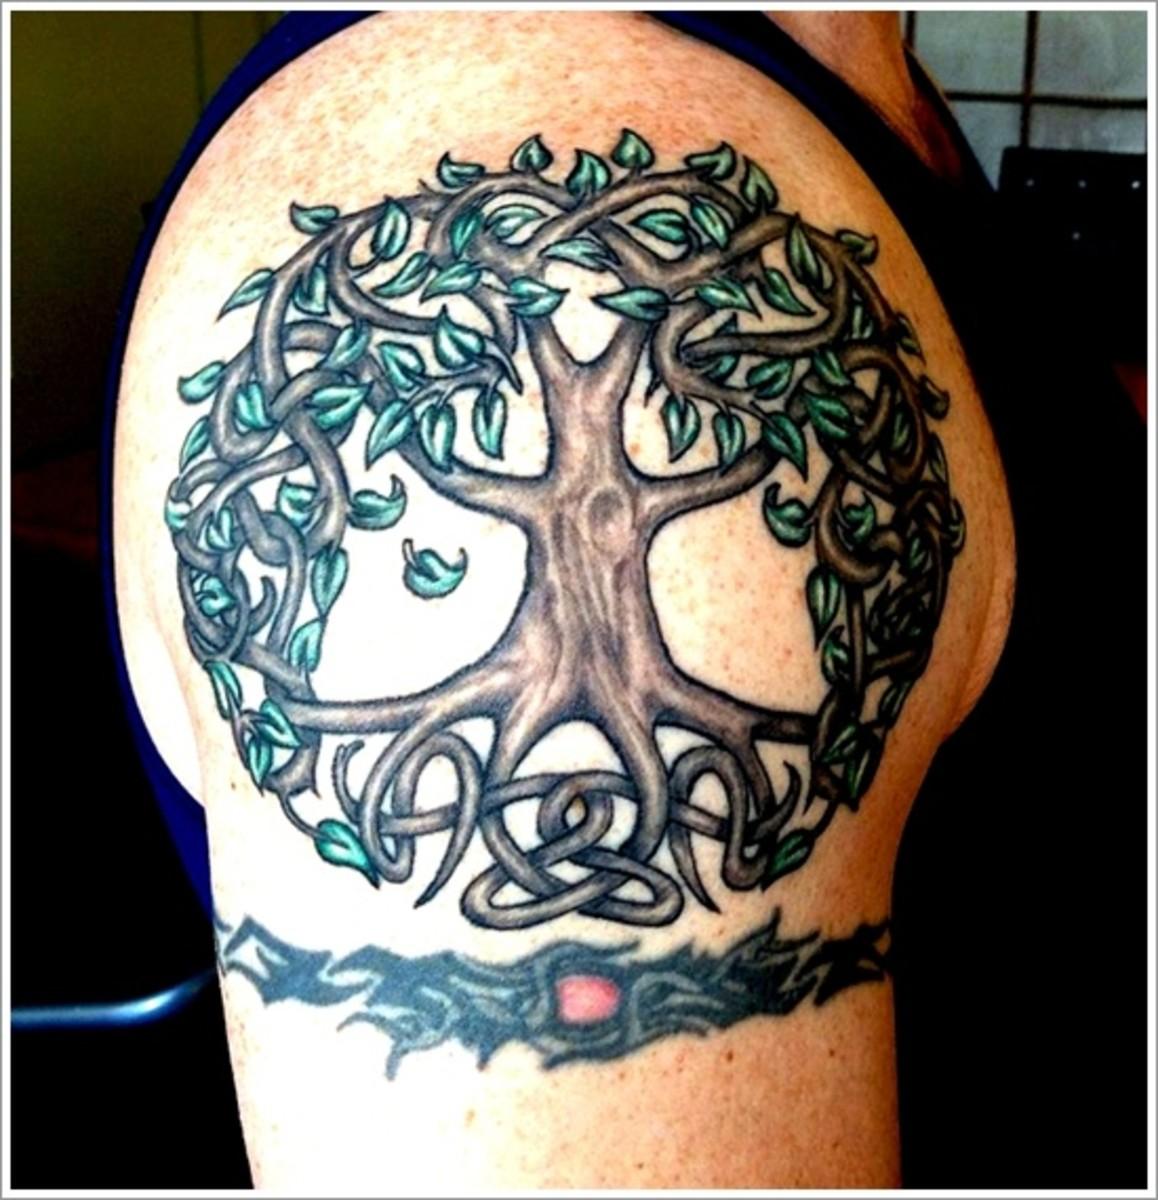 popular-tattoo-designs-for-2014-popular-tattoo-ideas-for-men-and-women